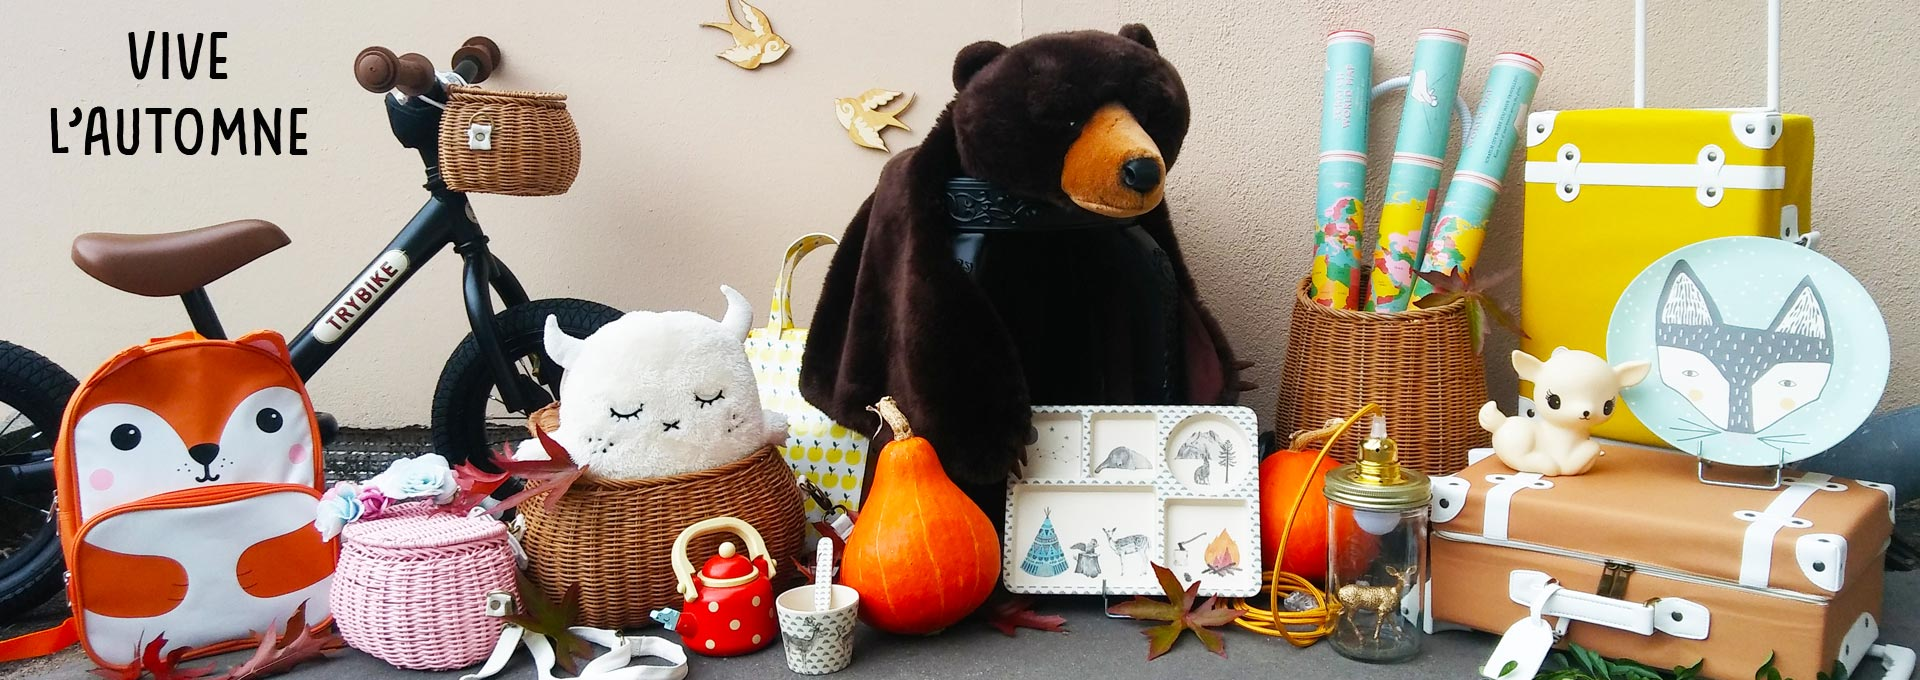 panier osier valise doudou peluche bambou ours biche